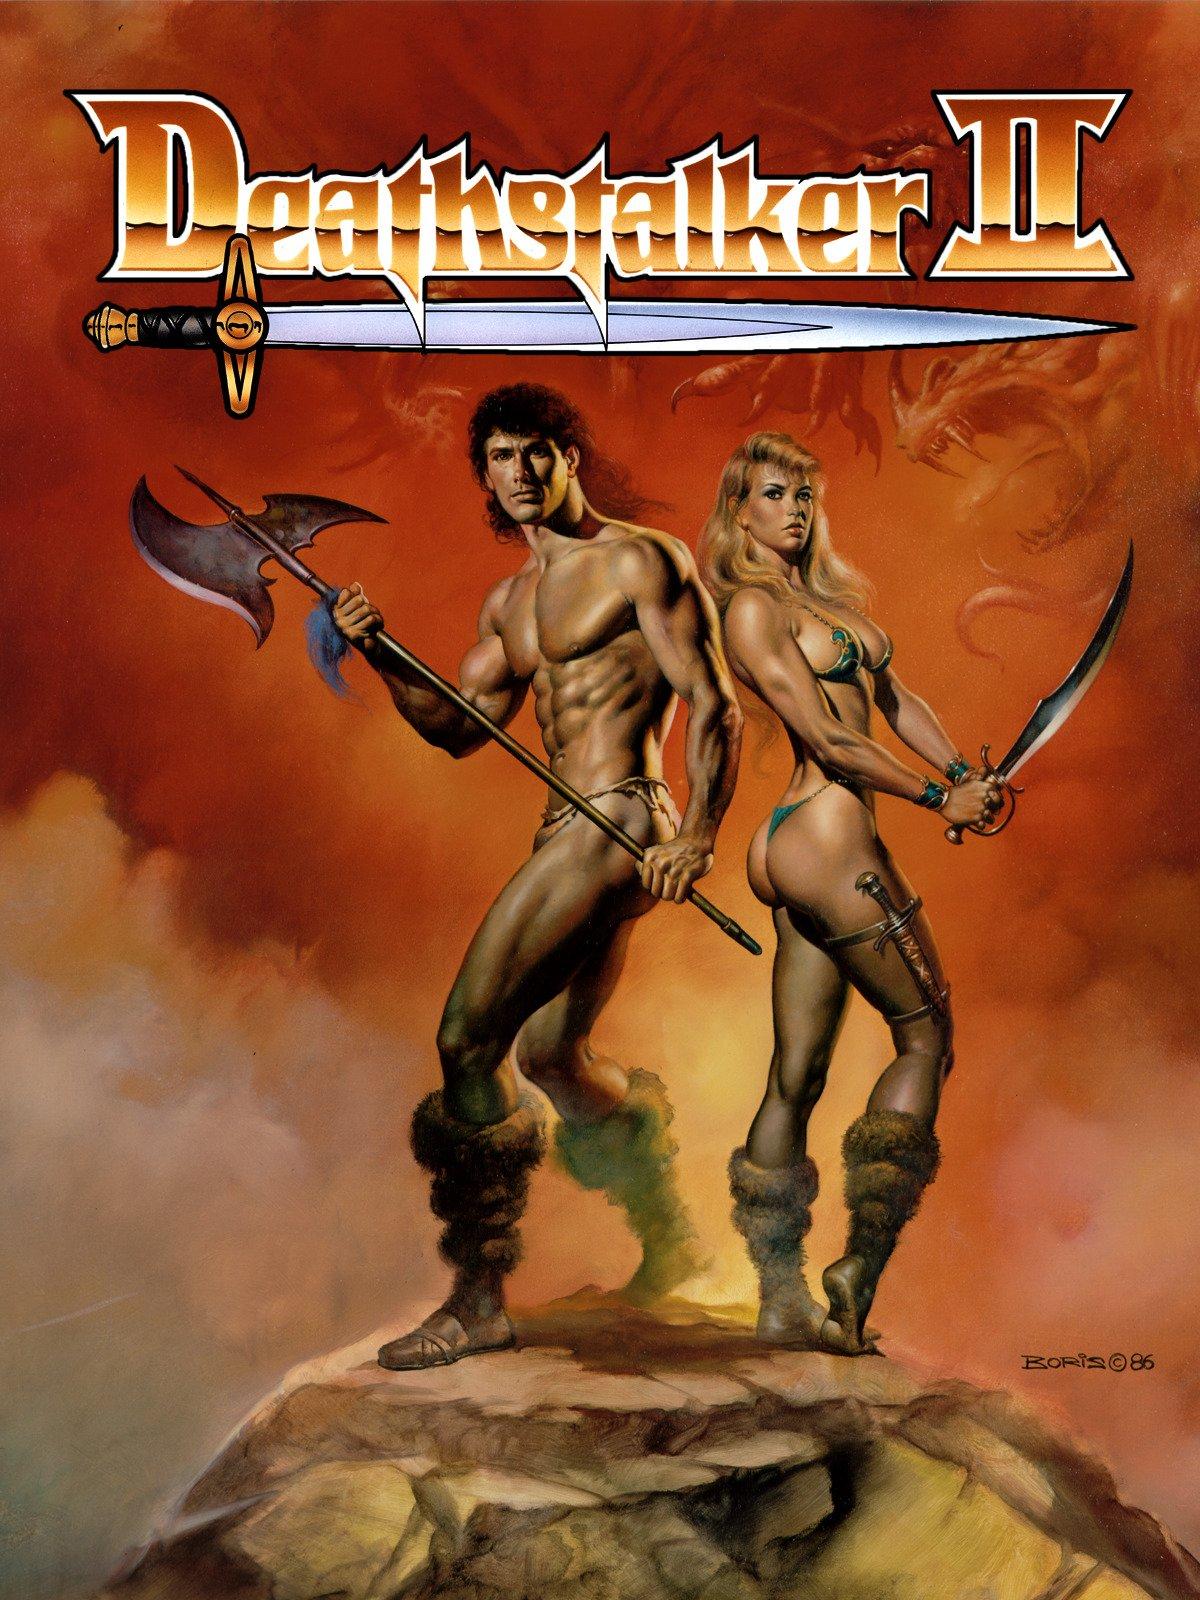 Deathstalker II on Amazon Prime Video UK